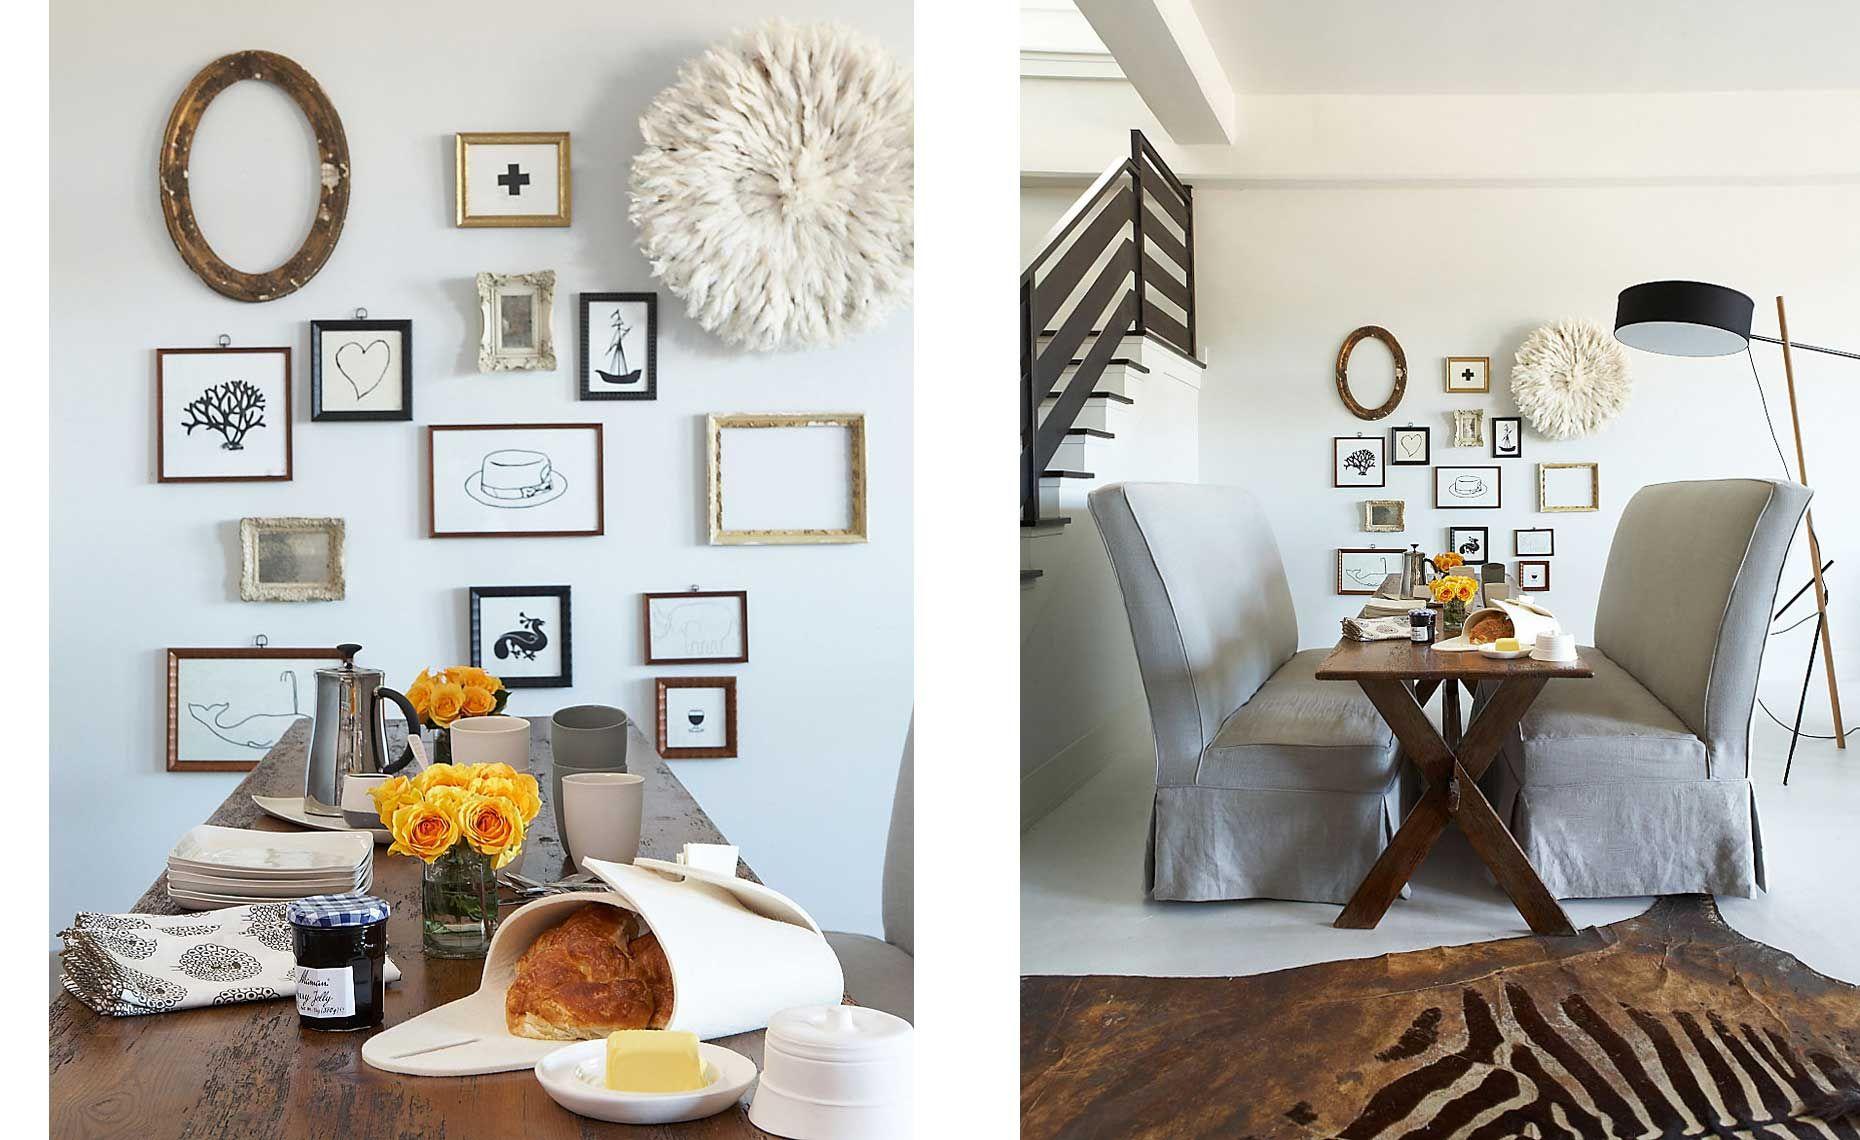 Mary clark interiorsarchitecturelifestyle interiors 1 interior design photography dining